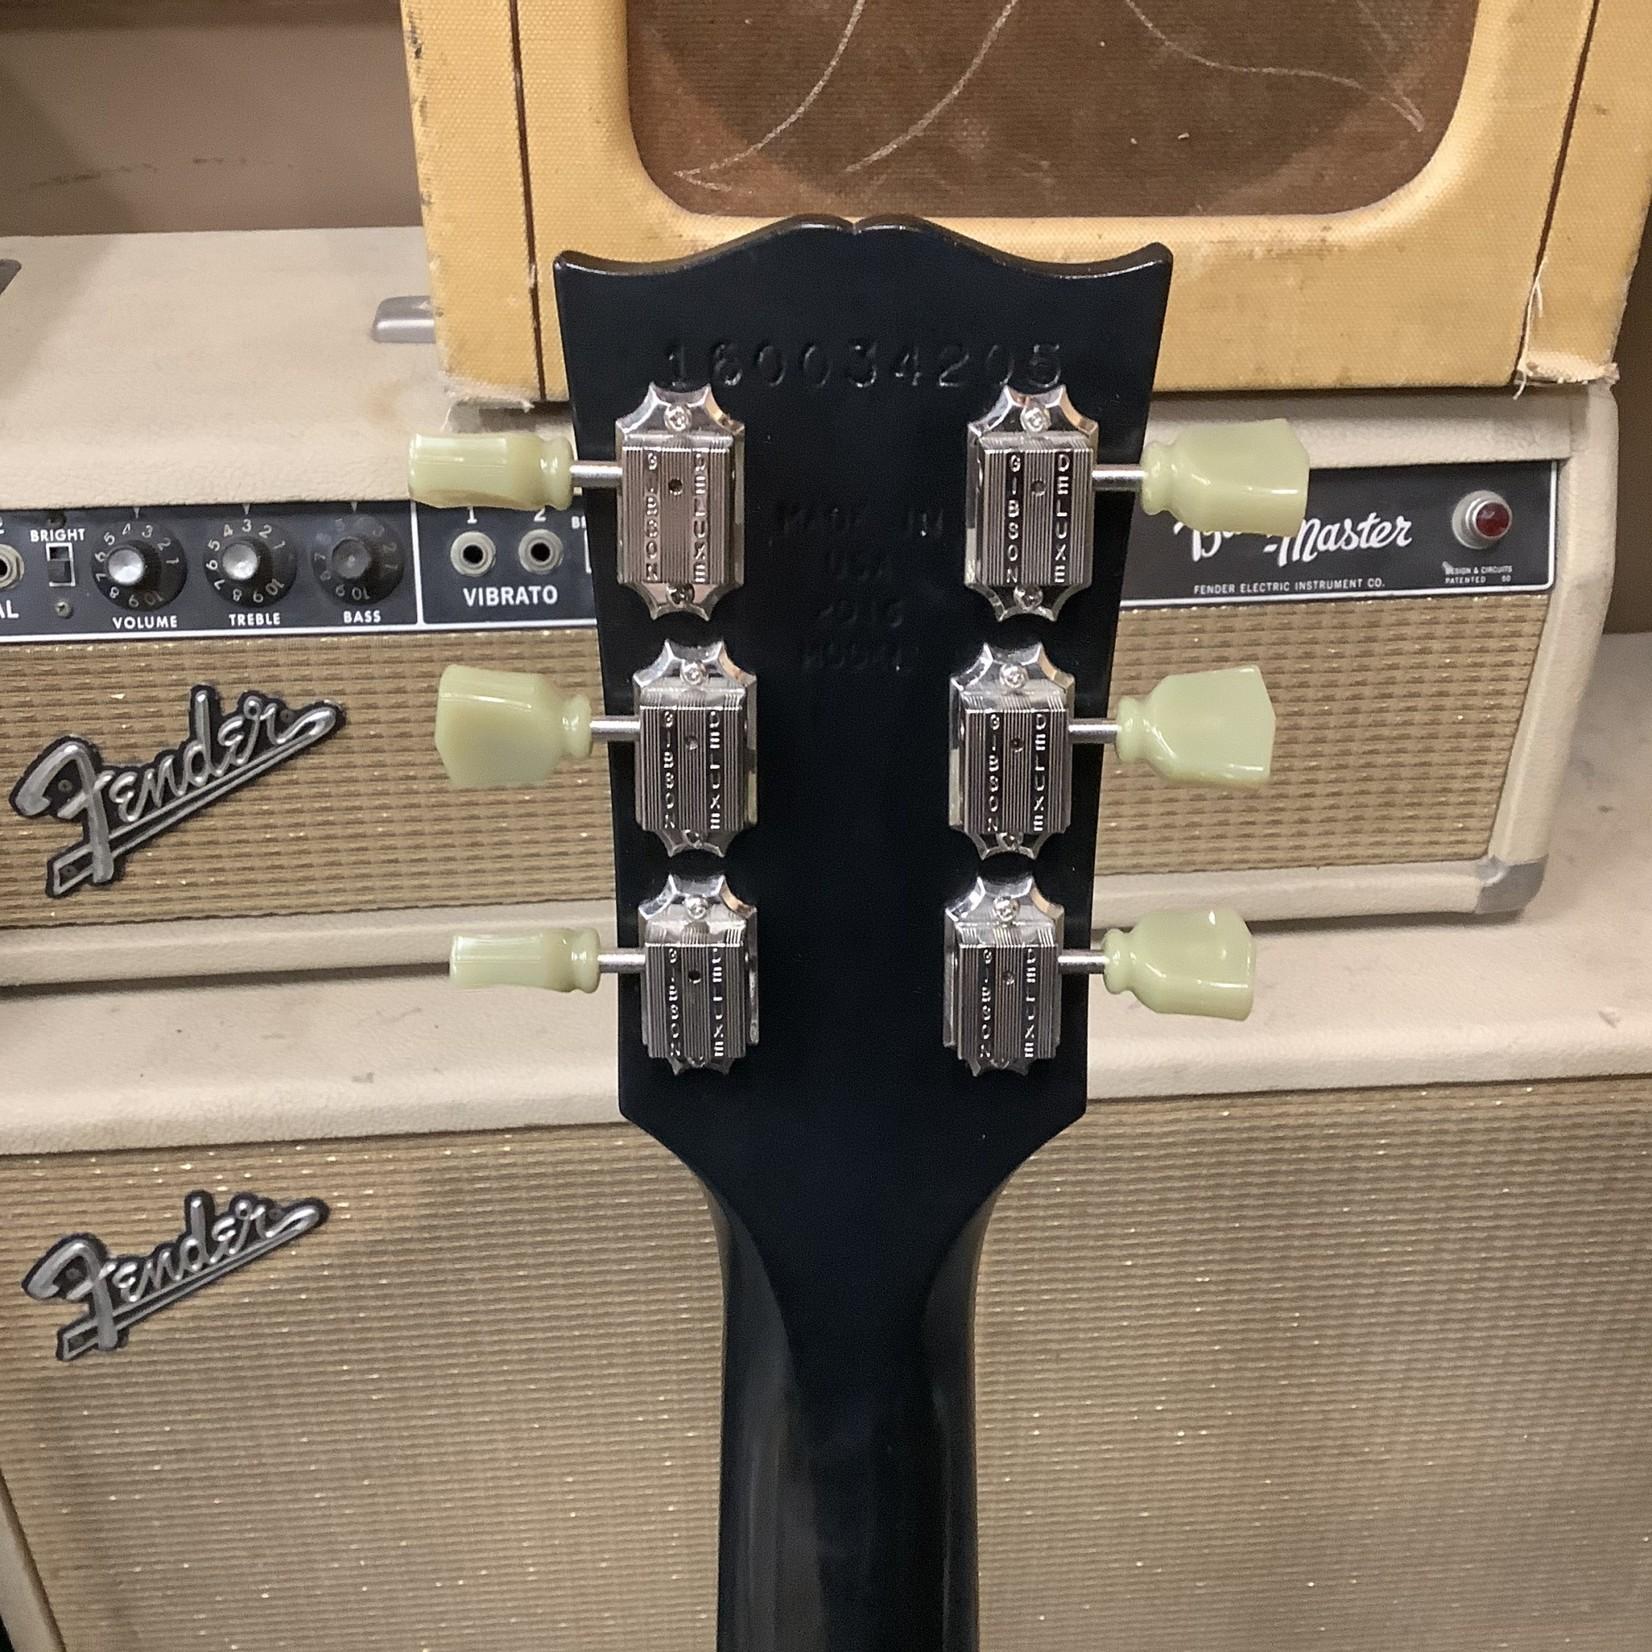 Gibson 2016 Gibson Les Paul Studio - DiMarzio Humbucker Added